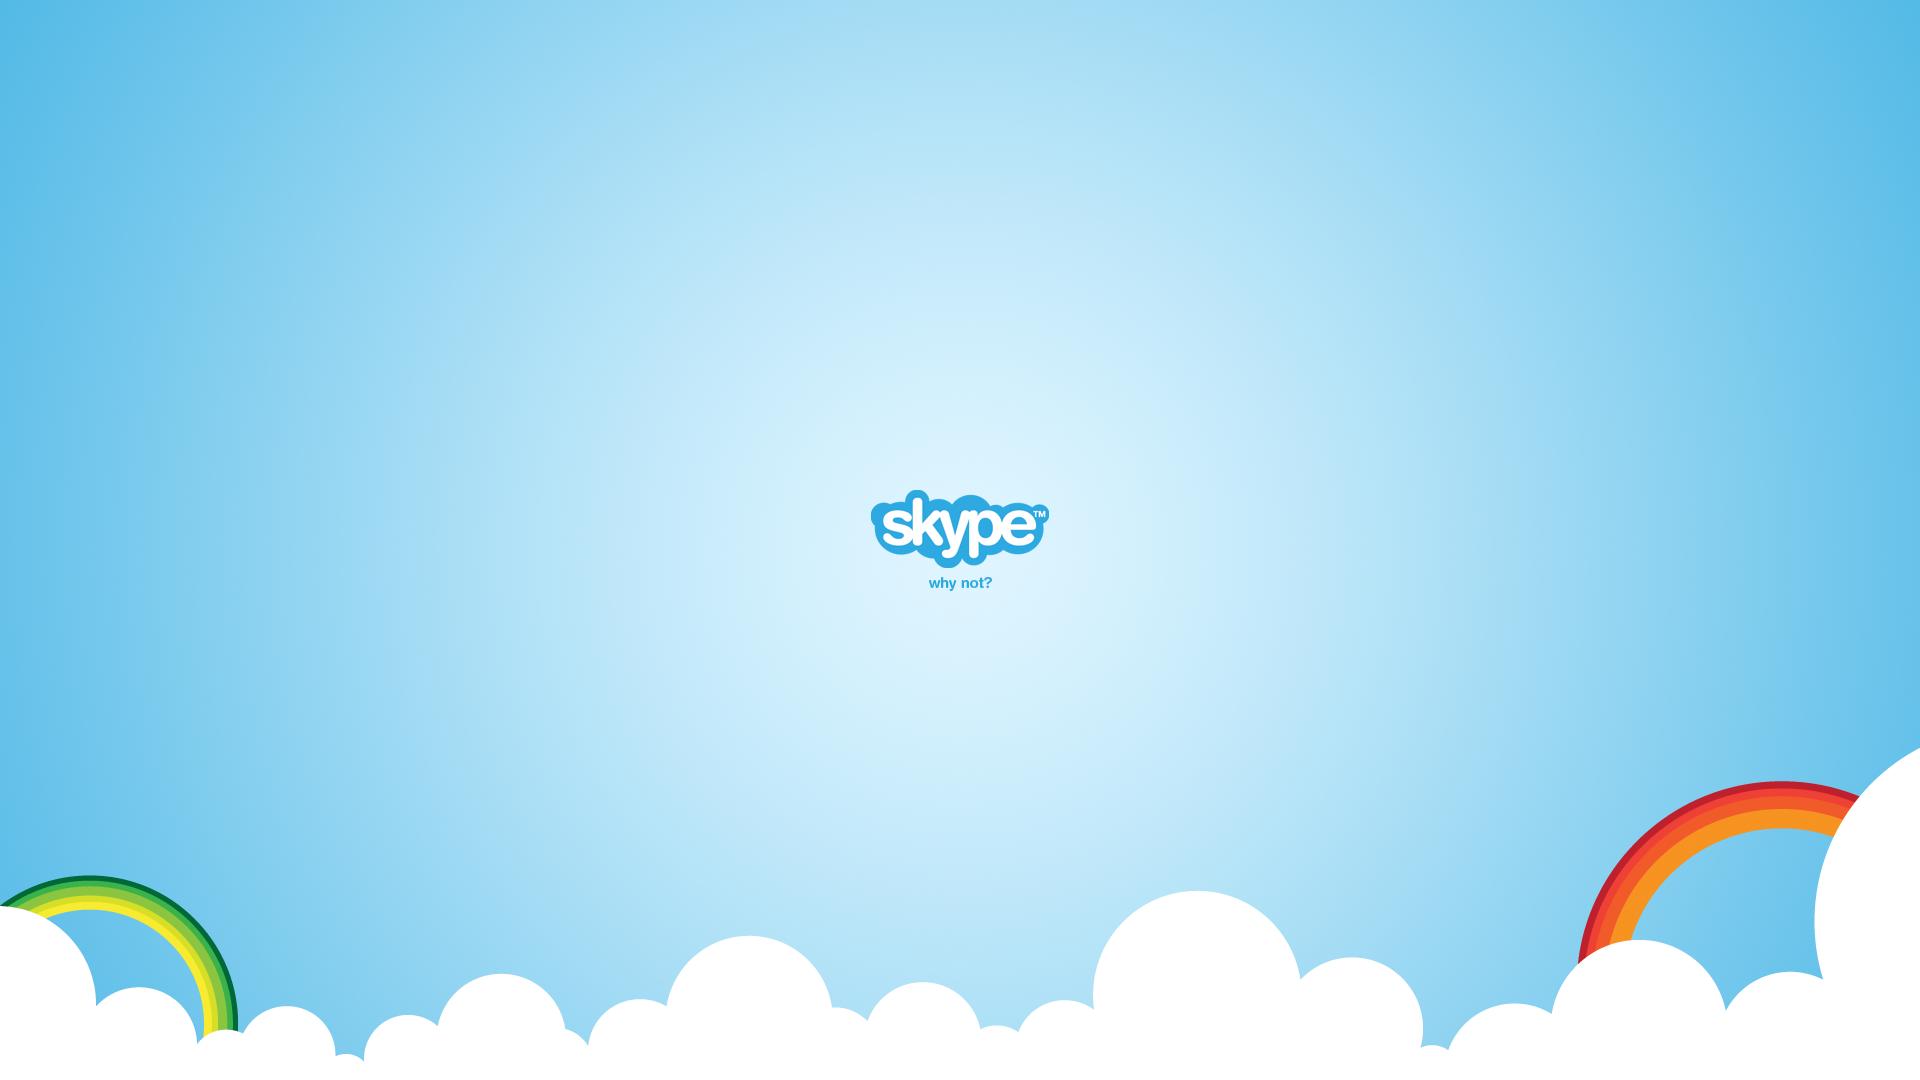 Skype Wallpaper